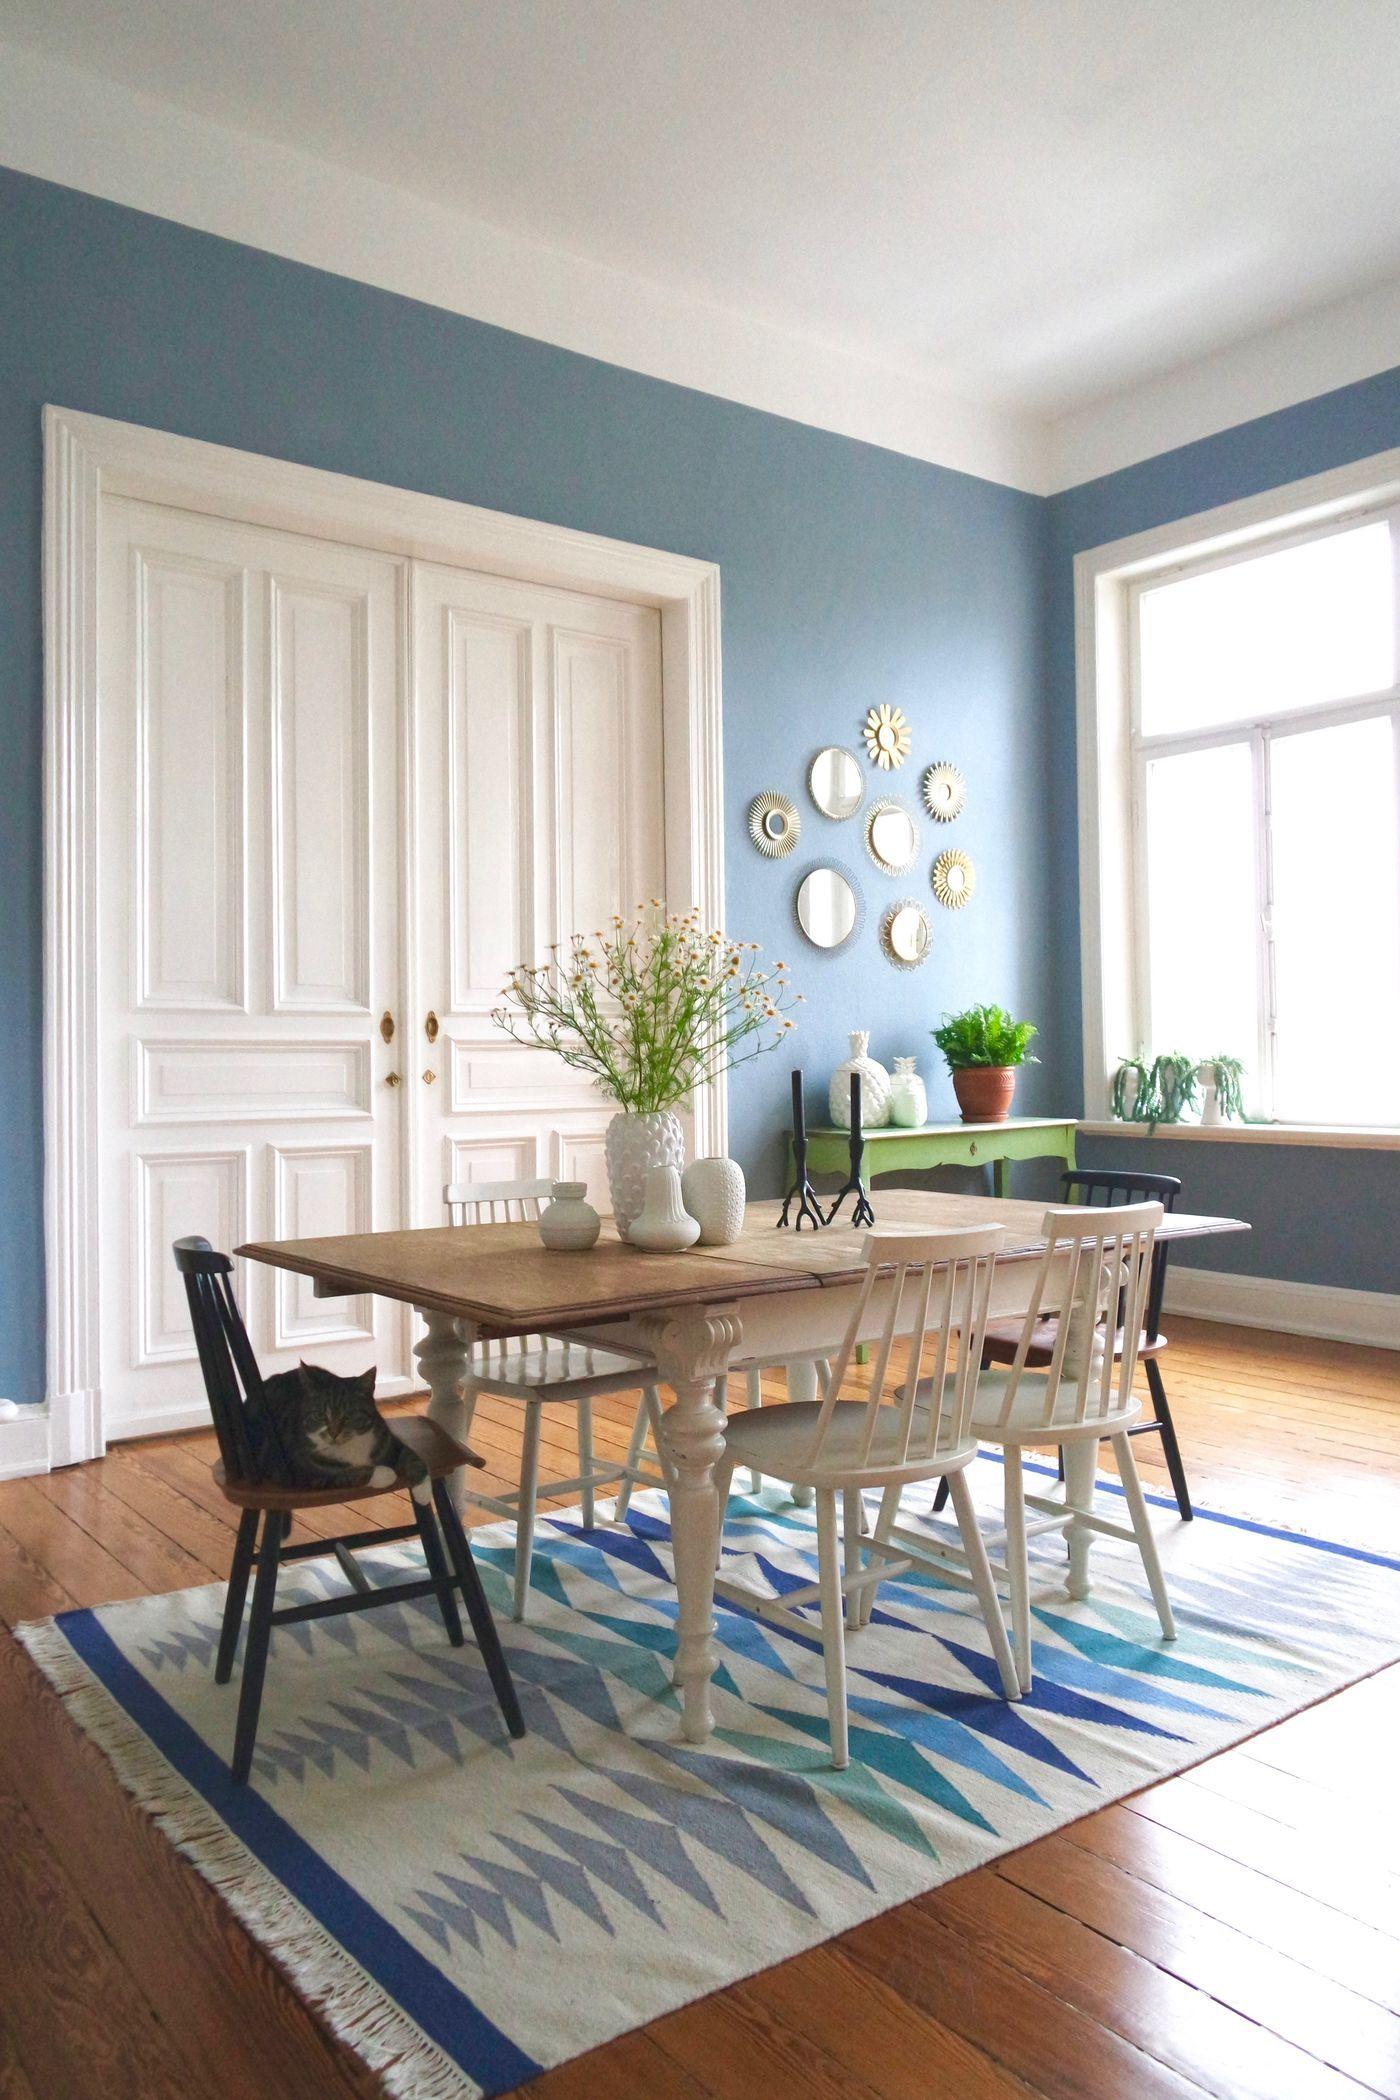 Wandfarbe Blau und Petrol Die besten Ideen fr Blautne